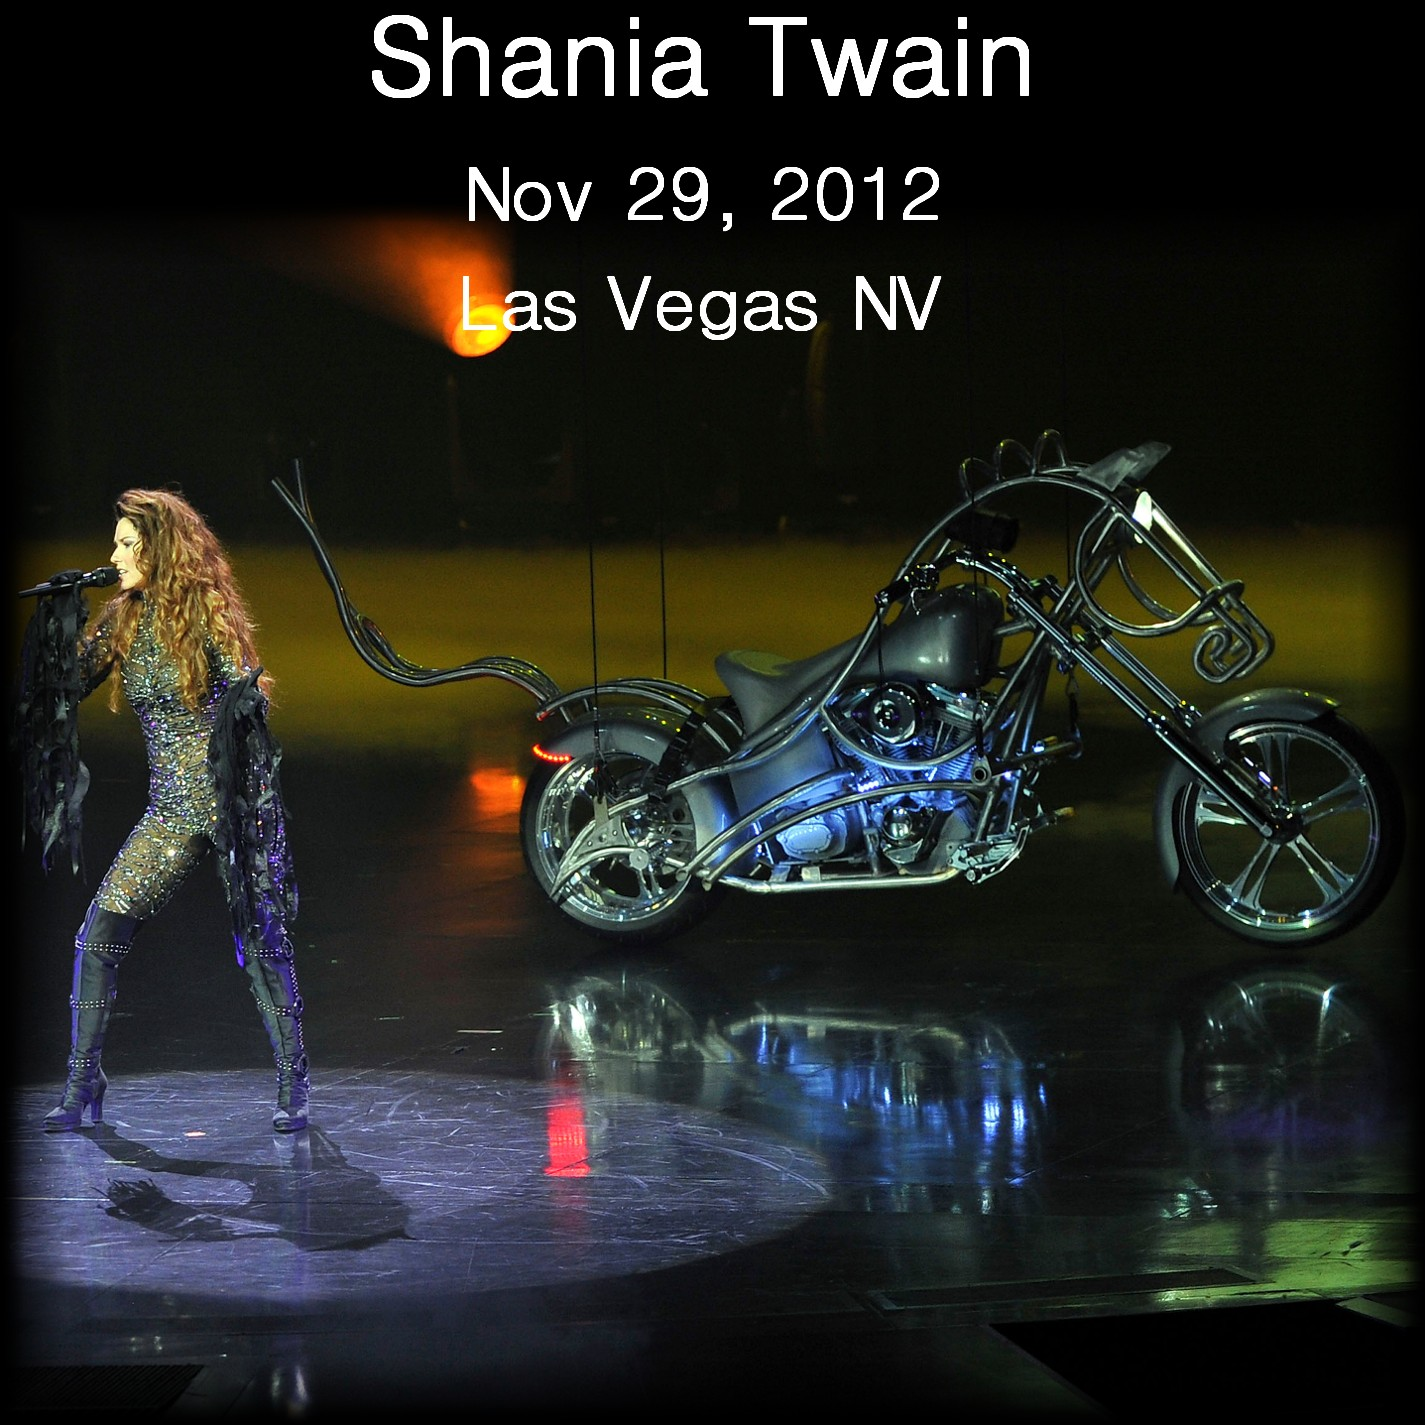 ShaniaTwain2012-11-29TheColosseumLasVegasNV.jpg